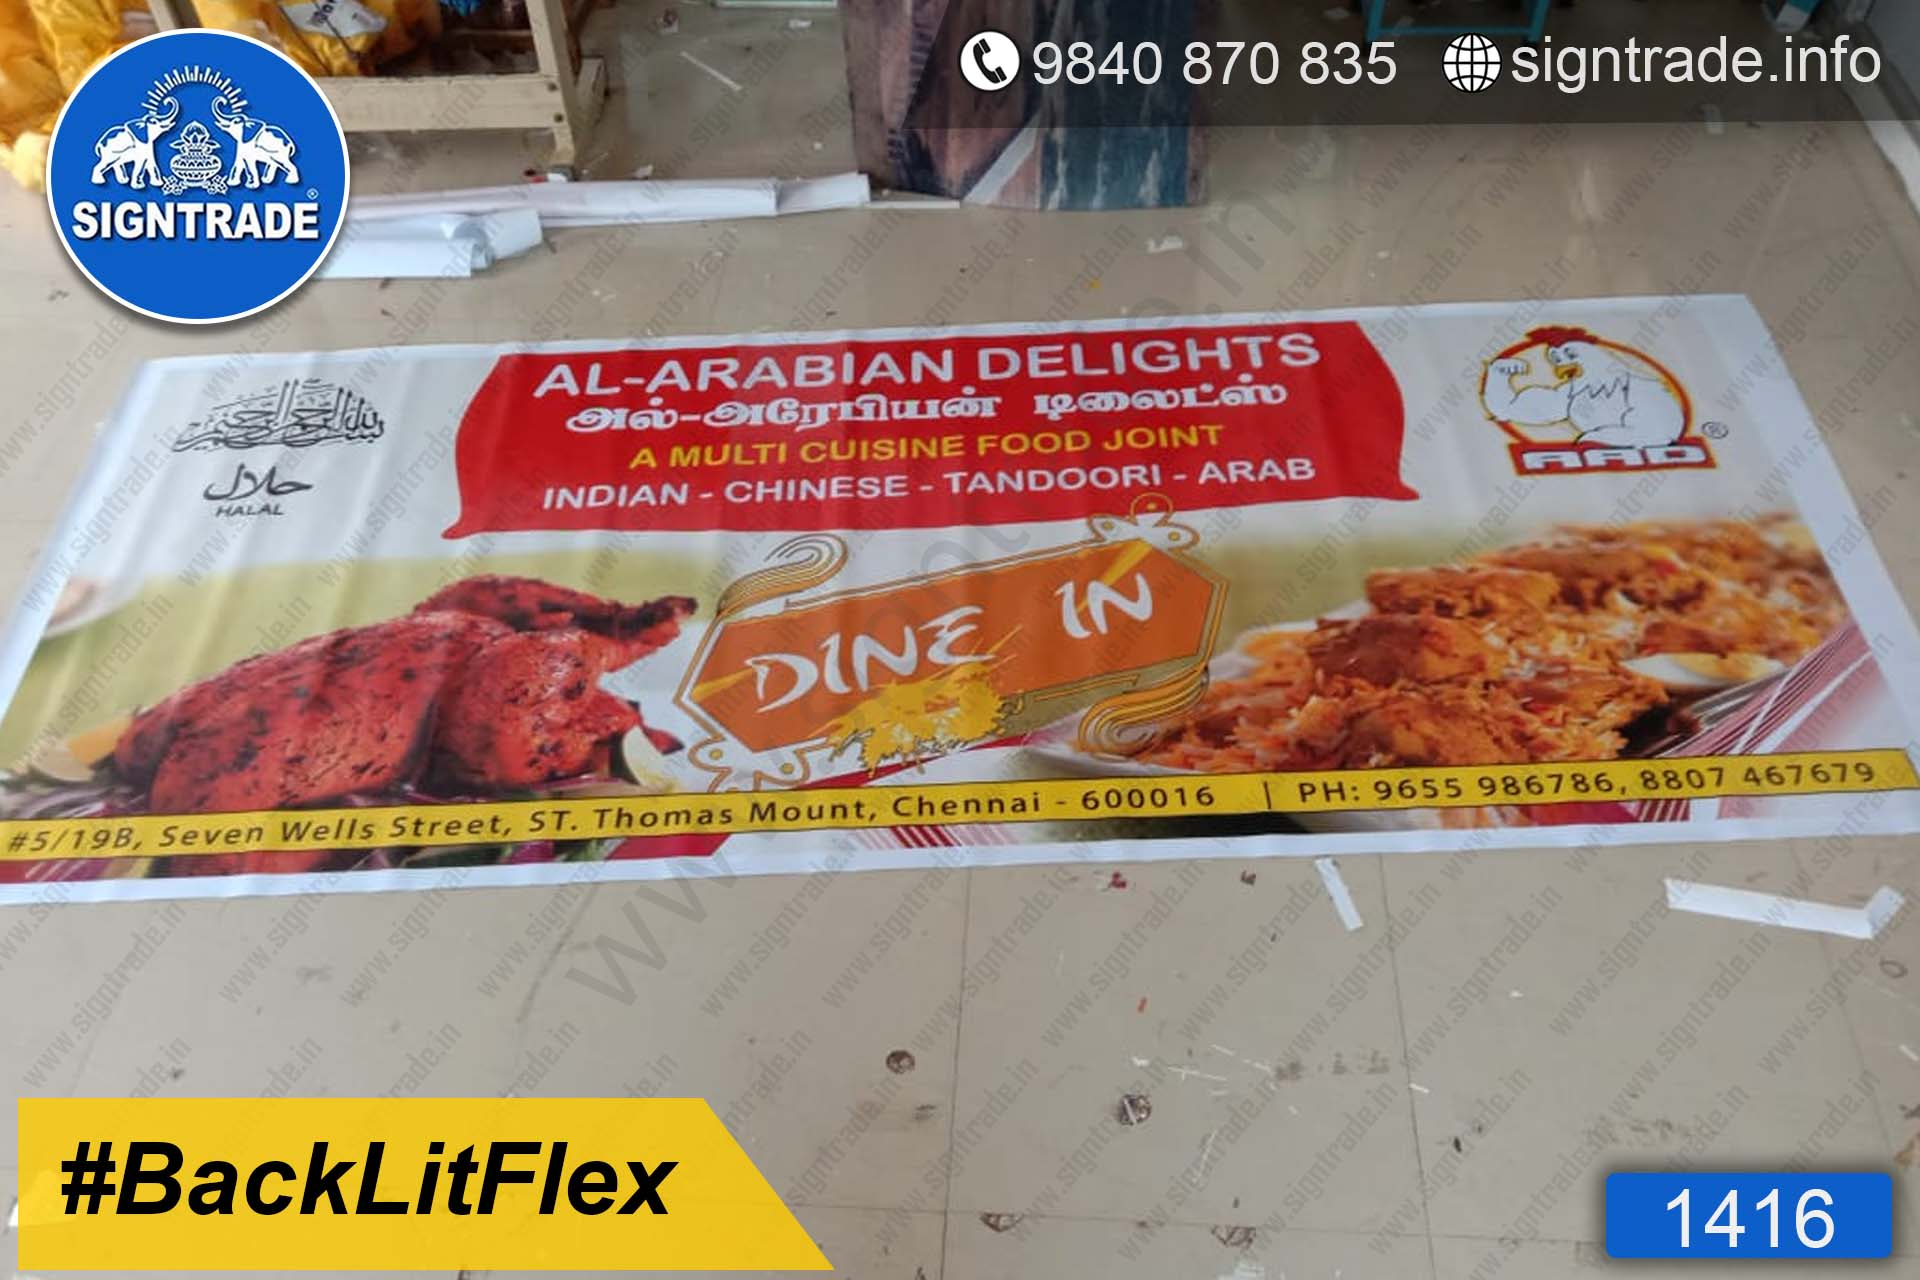 Al Arabian Delights Restaurant - 1416, Flex Board, Backlit Flex Board, Star Backlit Flex Board, Backlit Flex Banners, Shop Front Flex Board, Shop Flex Board